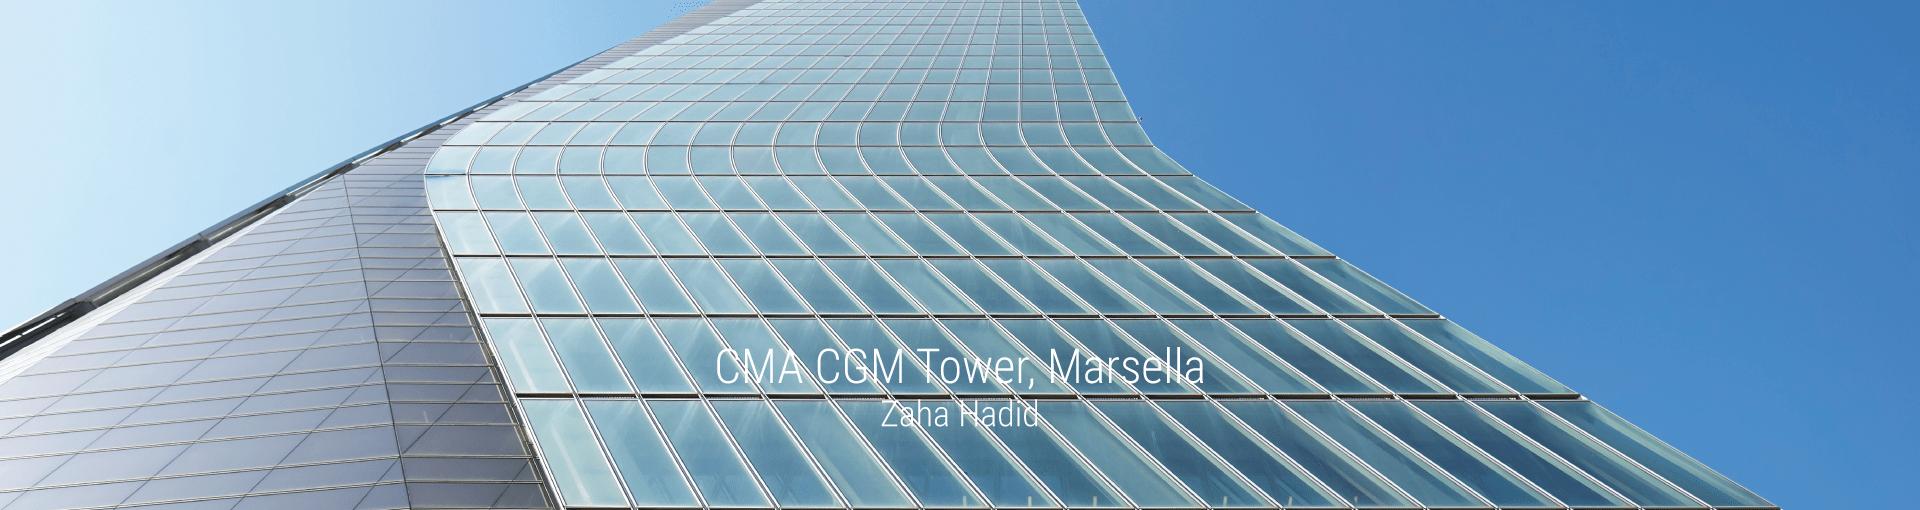 CMA CGM Tower - Marsella